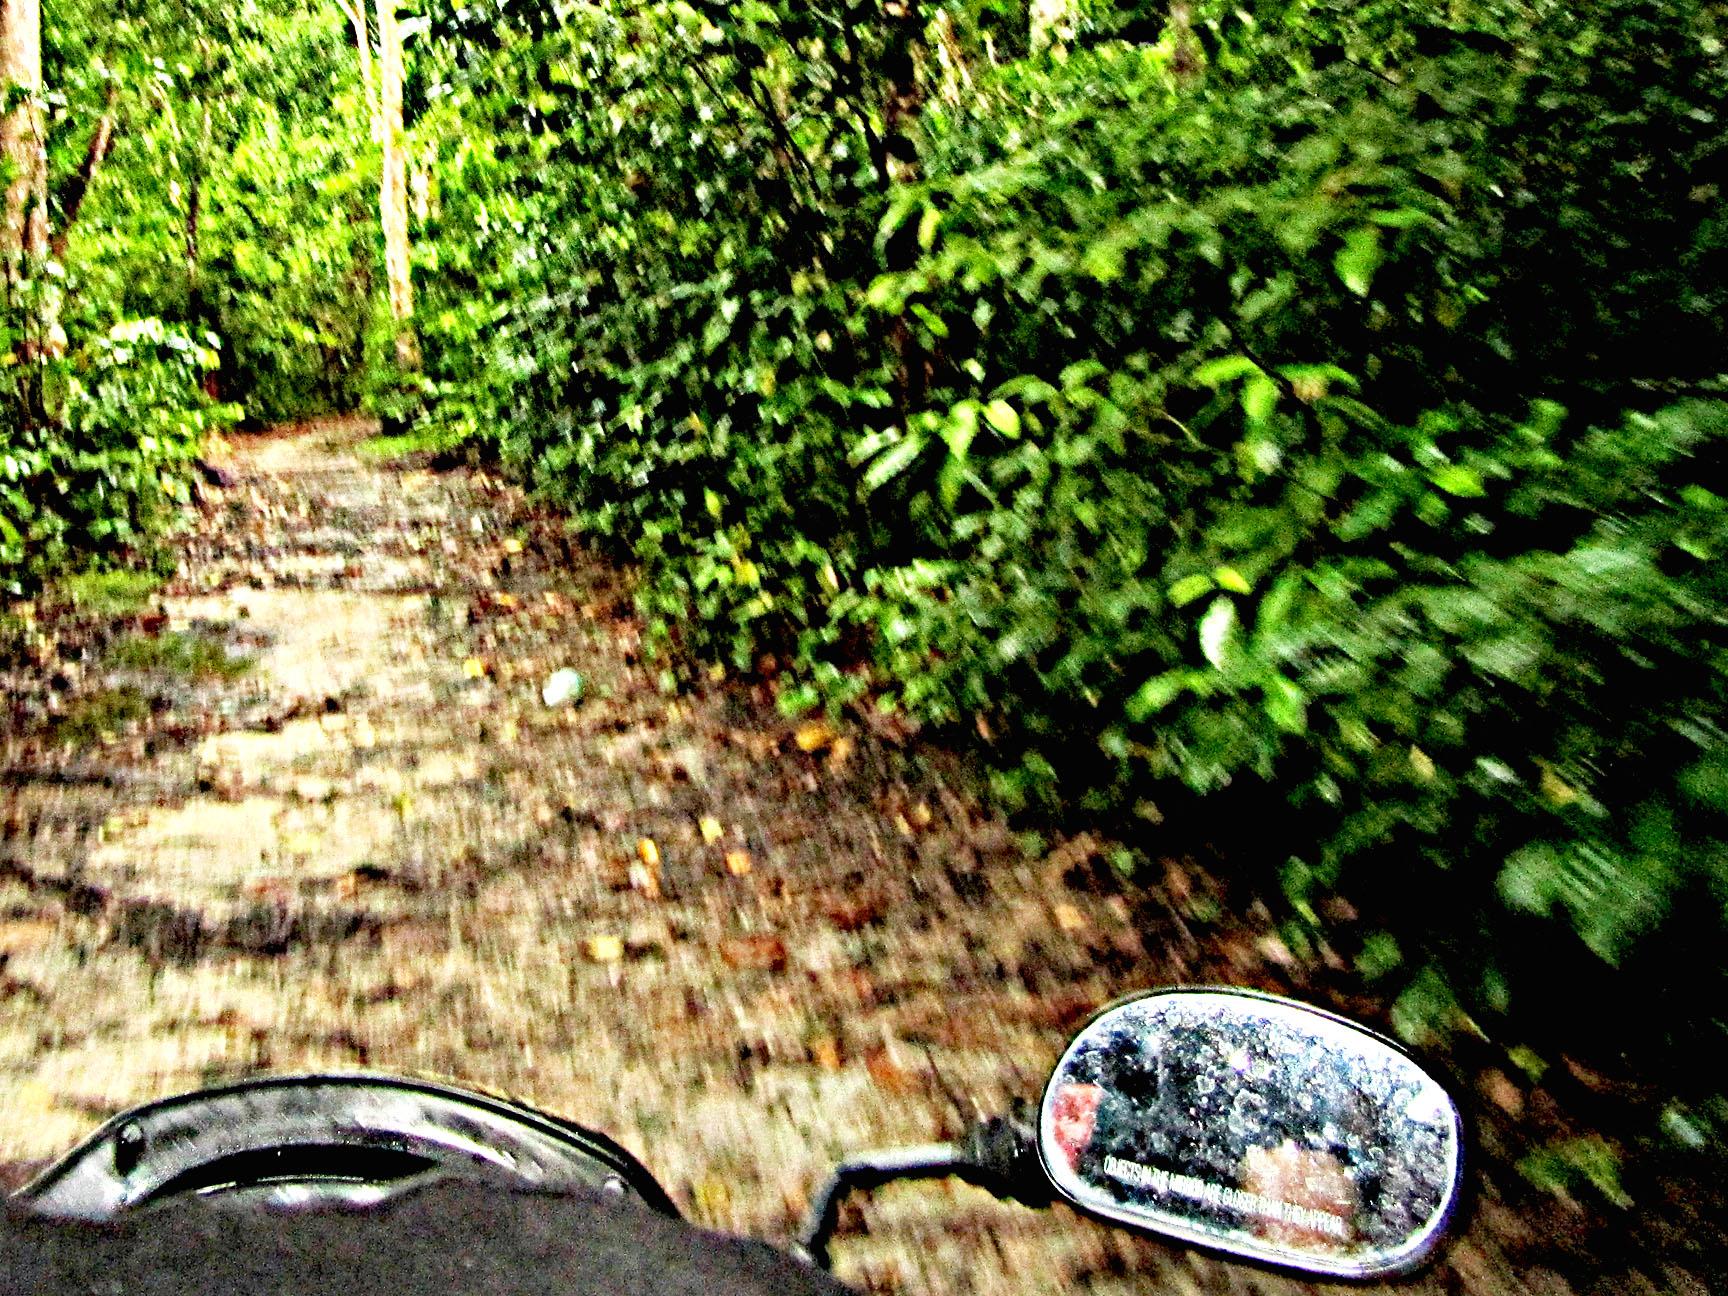 Hema_pose_ses_valises_scooter_andaman_island_inde